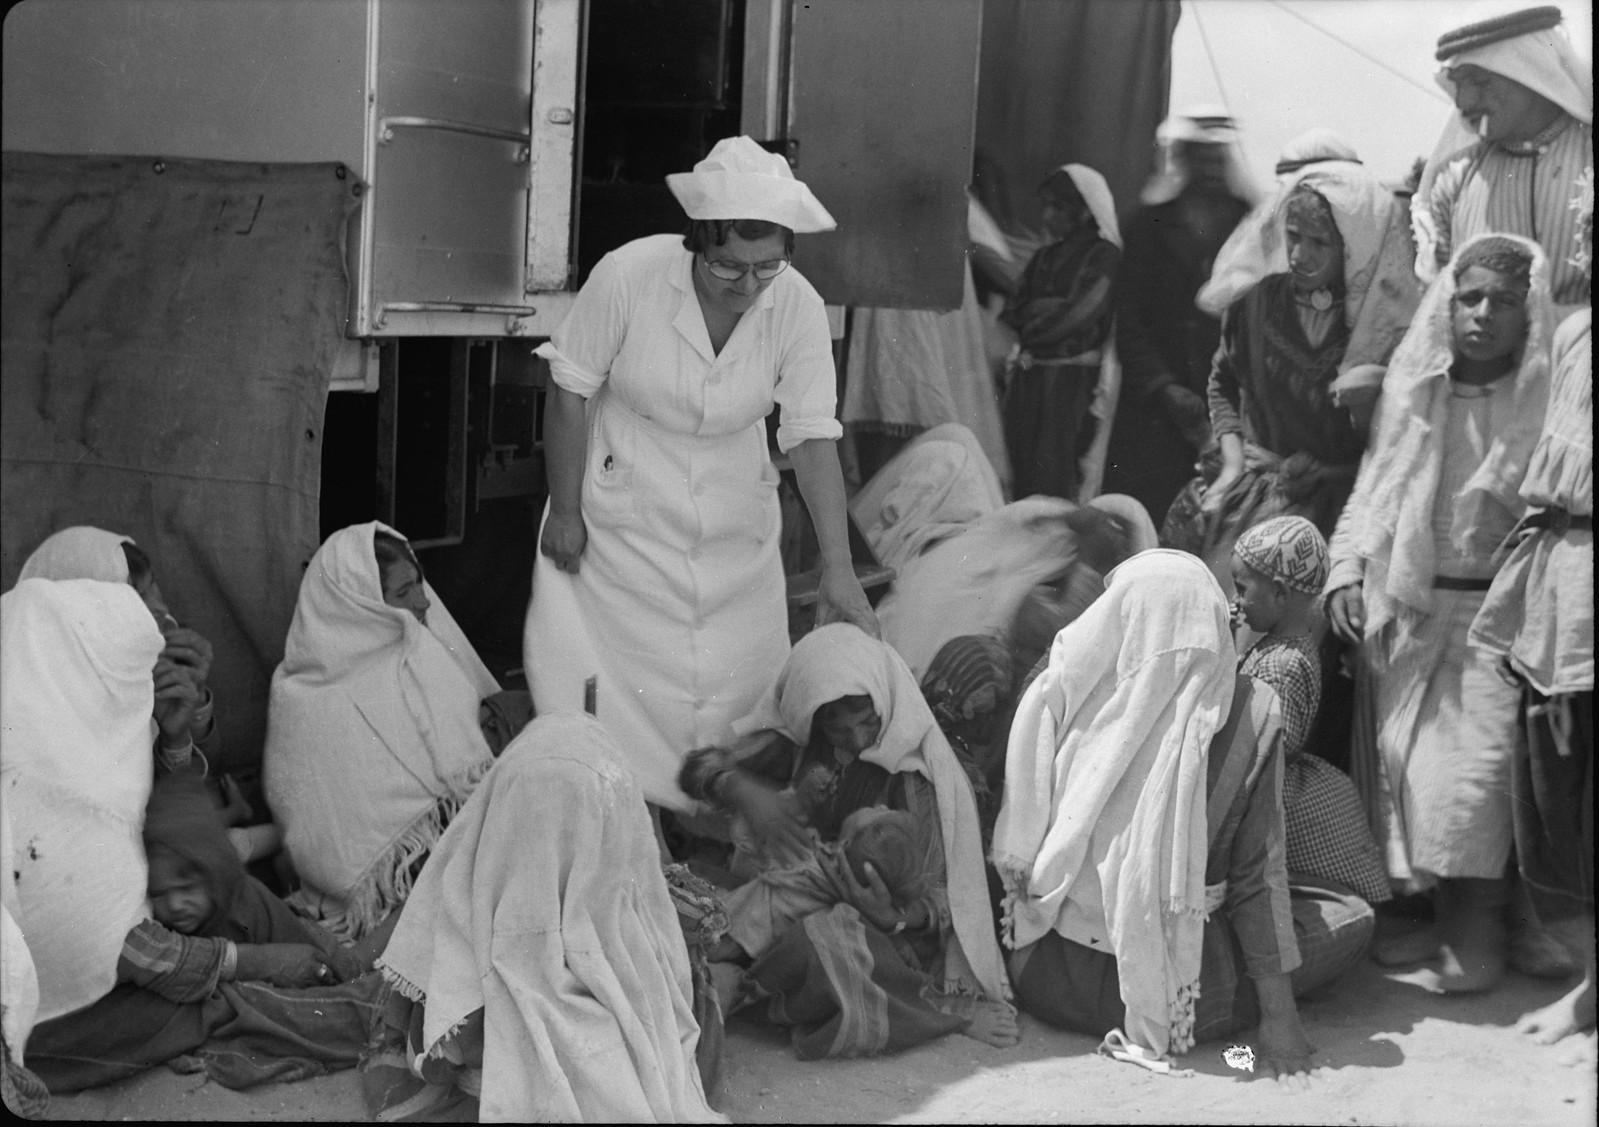 Одна из медсестер возле фургона среди женщин и детей деревни